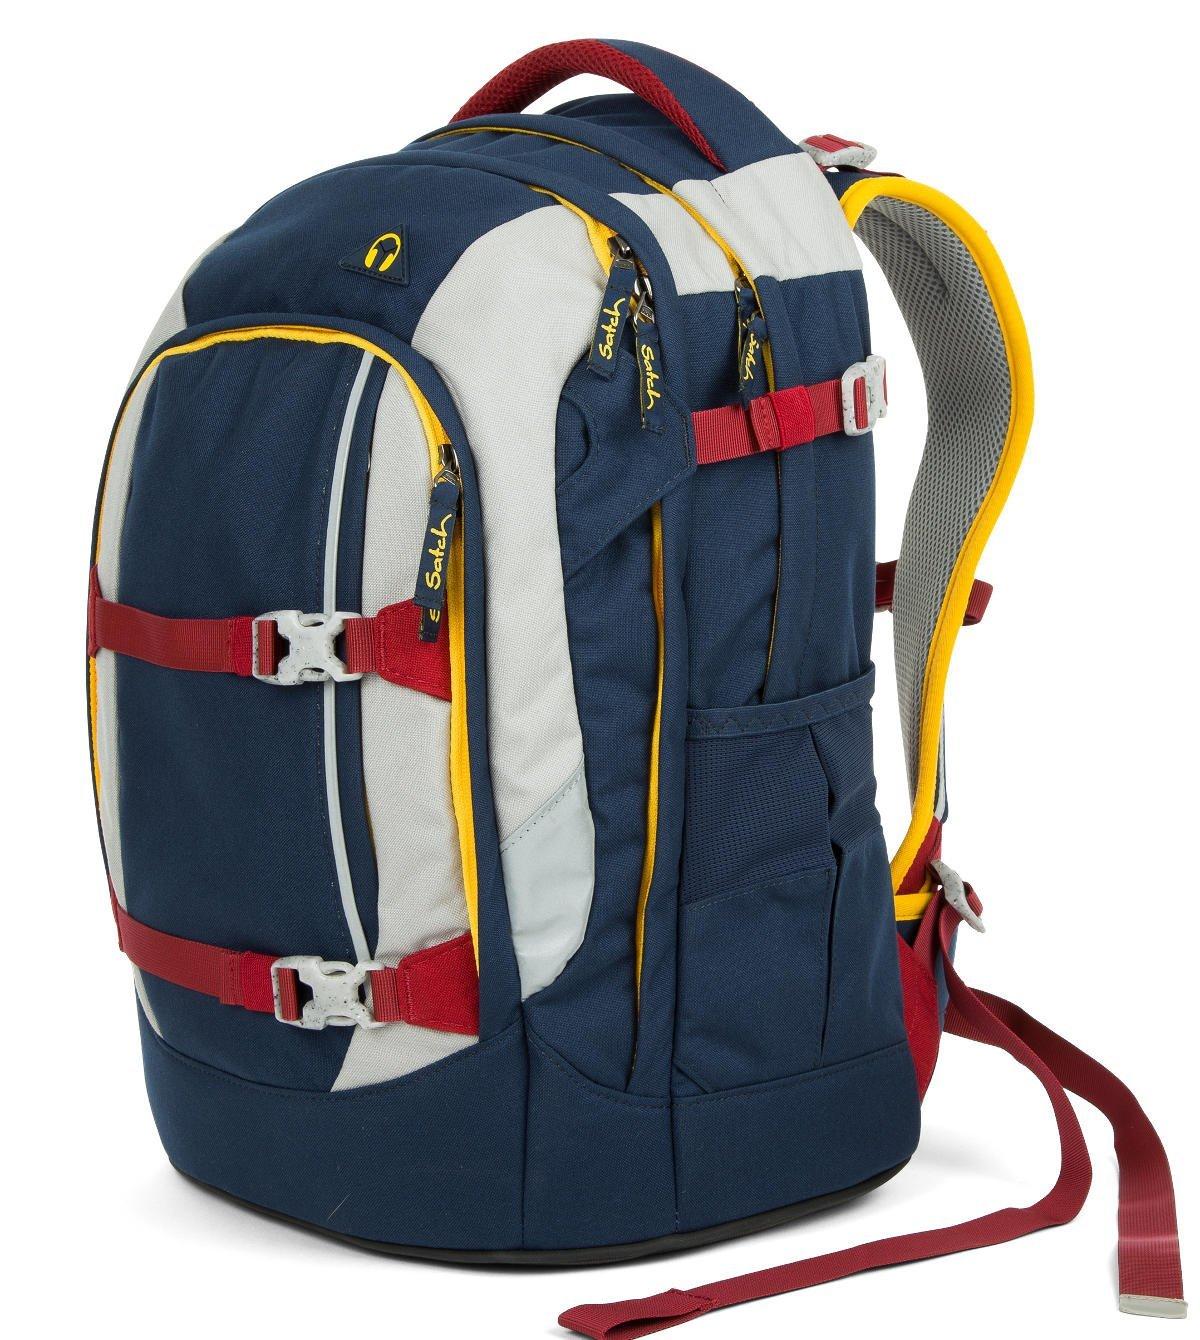 Satch Pack рюкзак для школьника цвет Flash Hopper, - фото 1